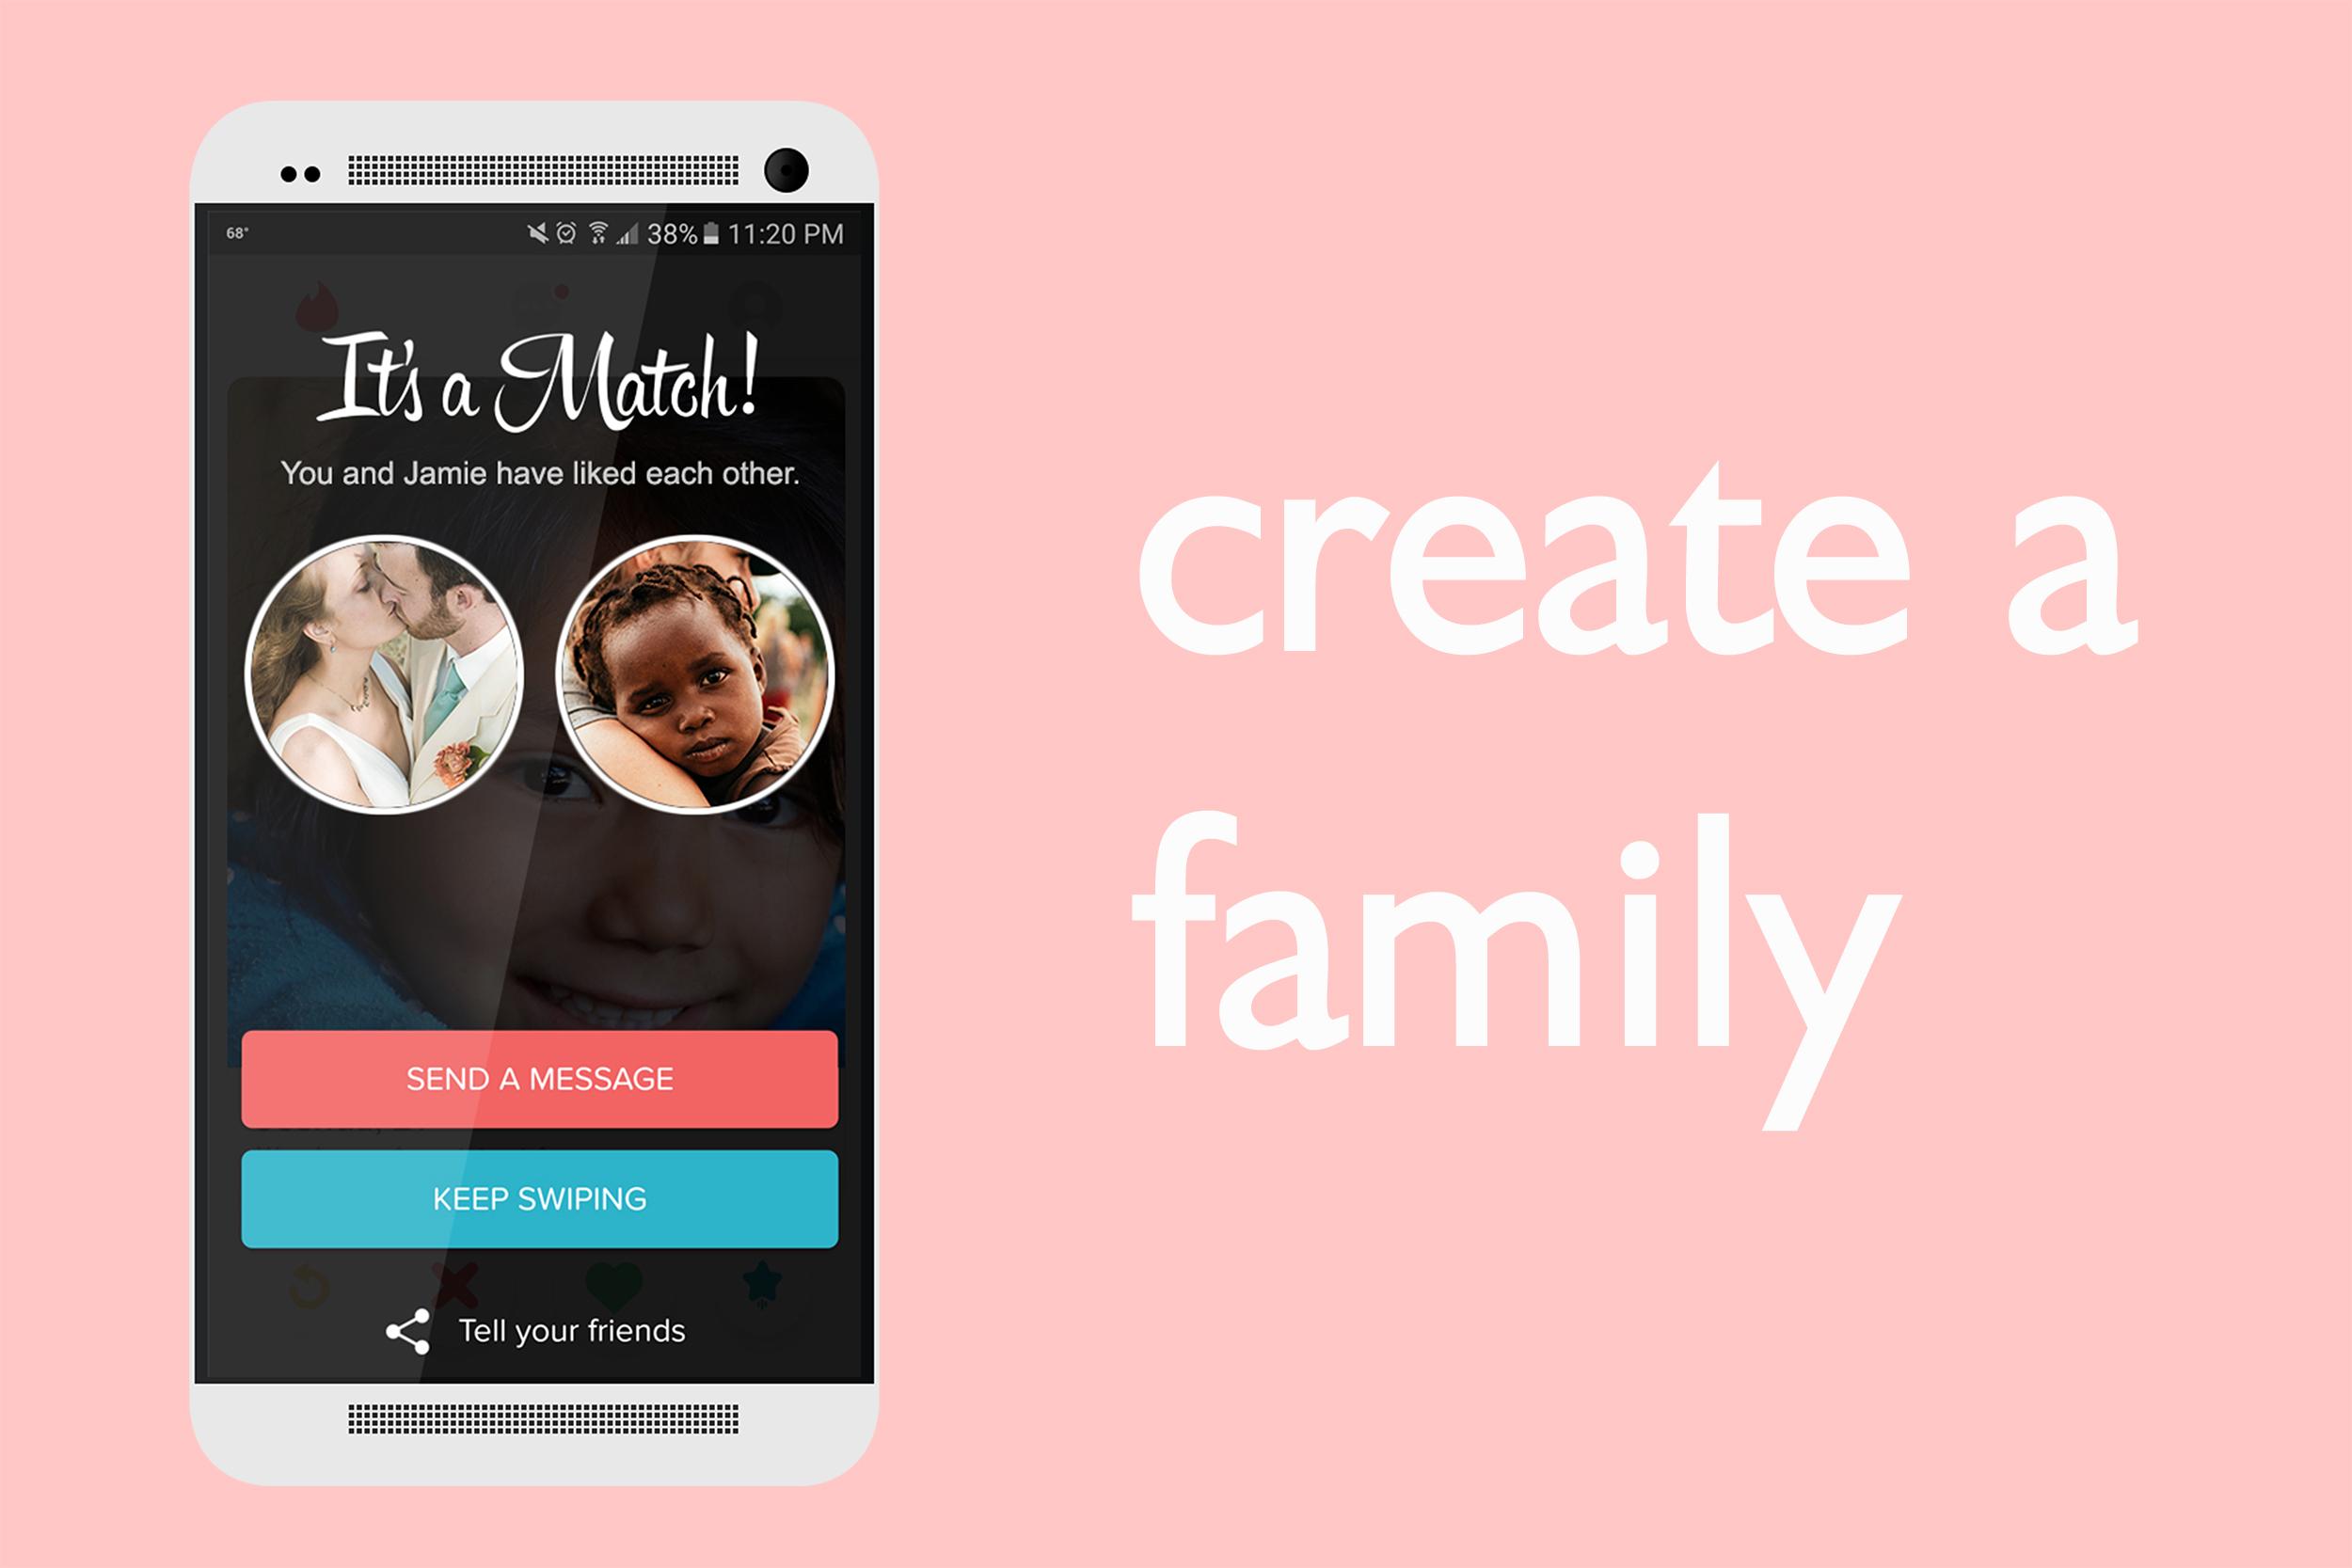 create-family-small-whitw